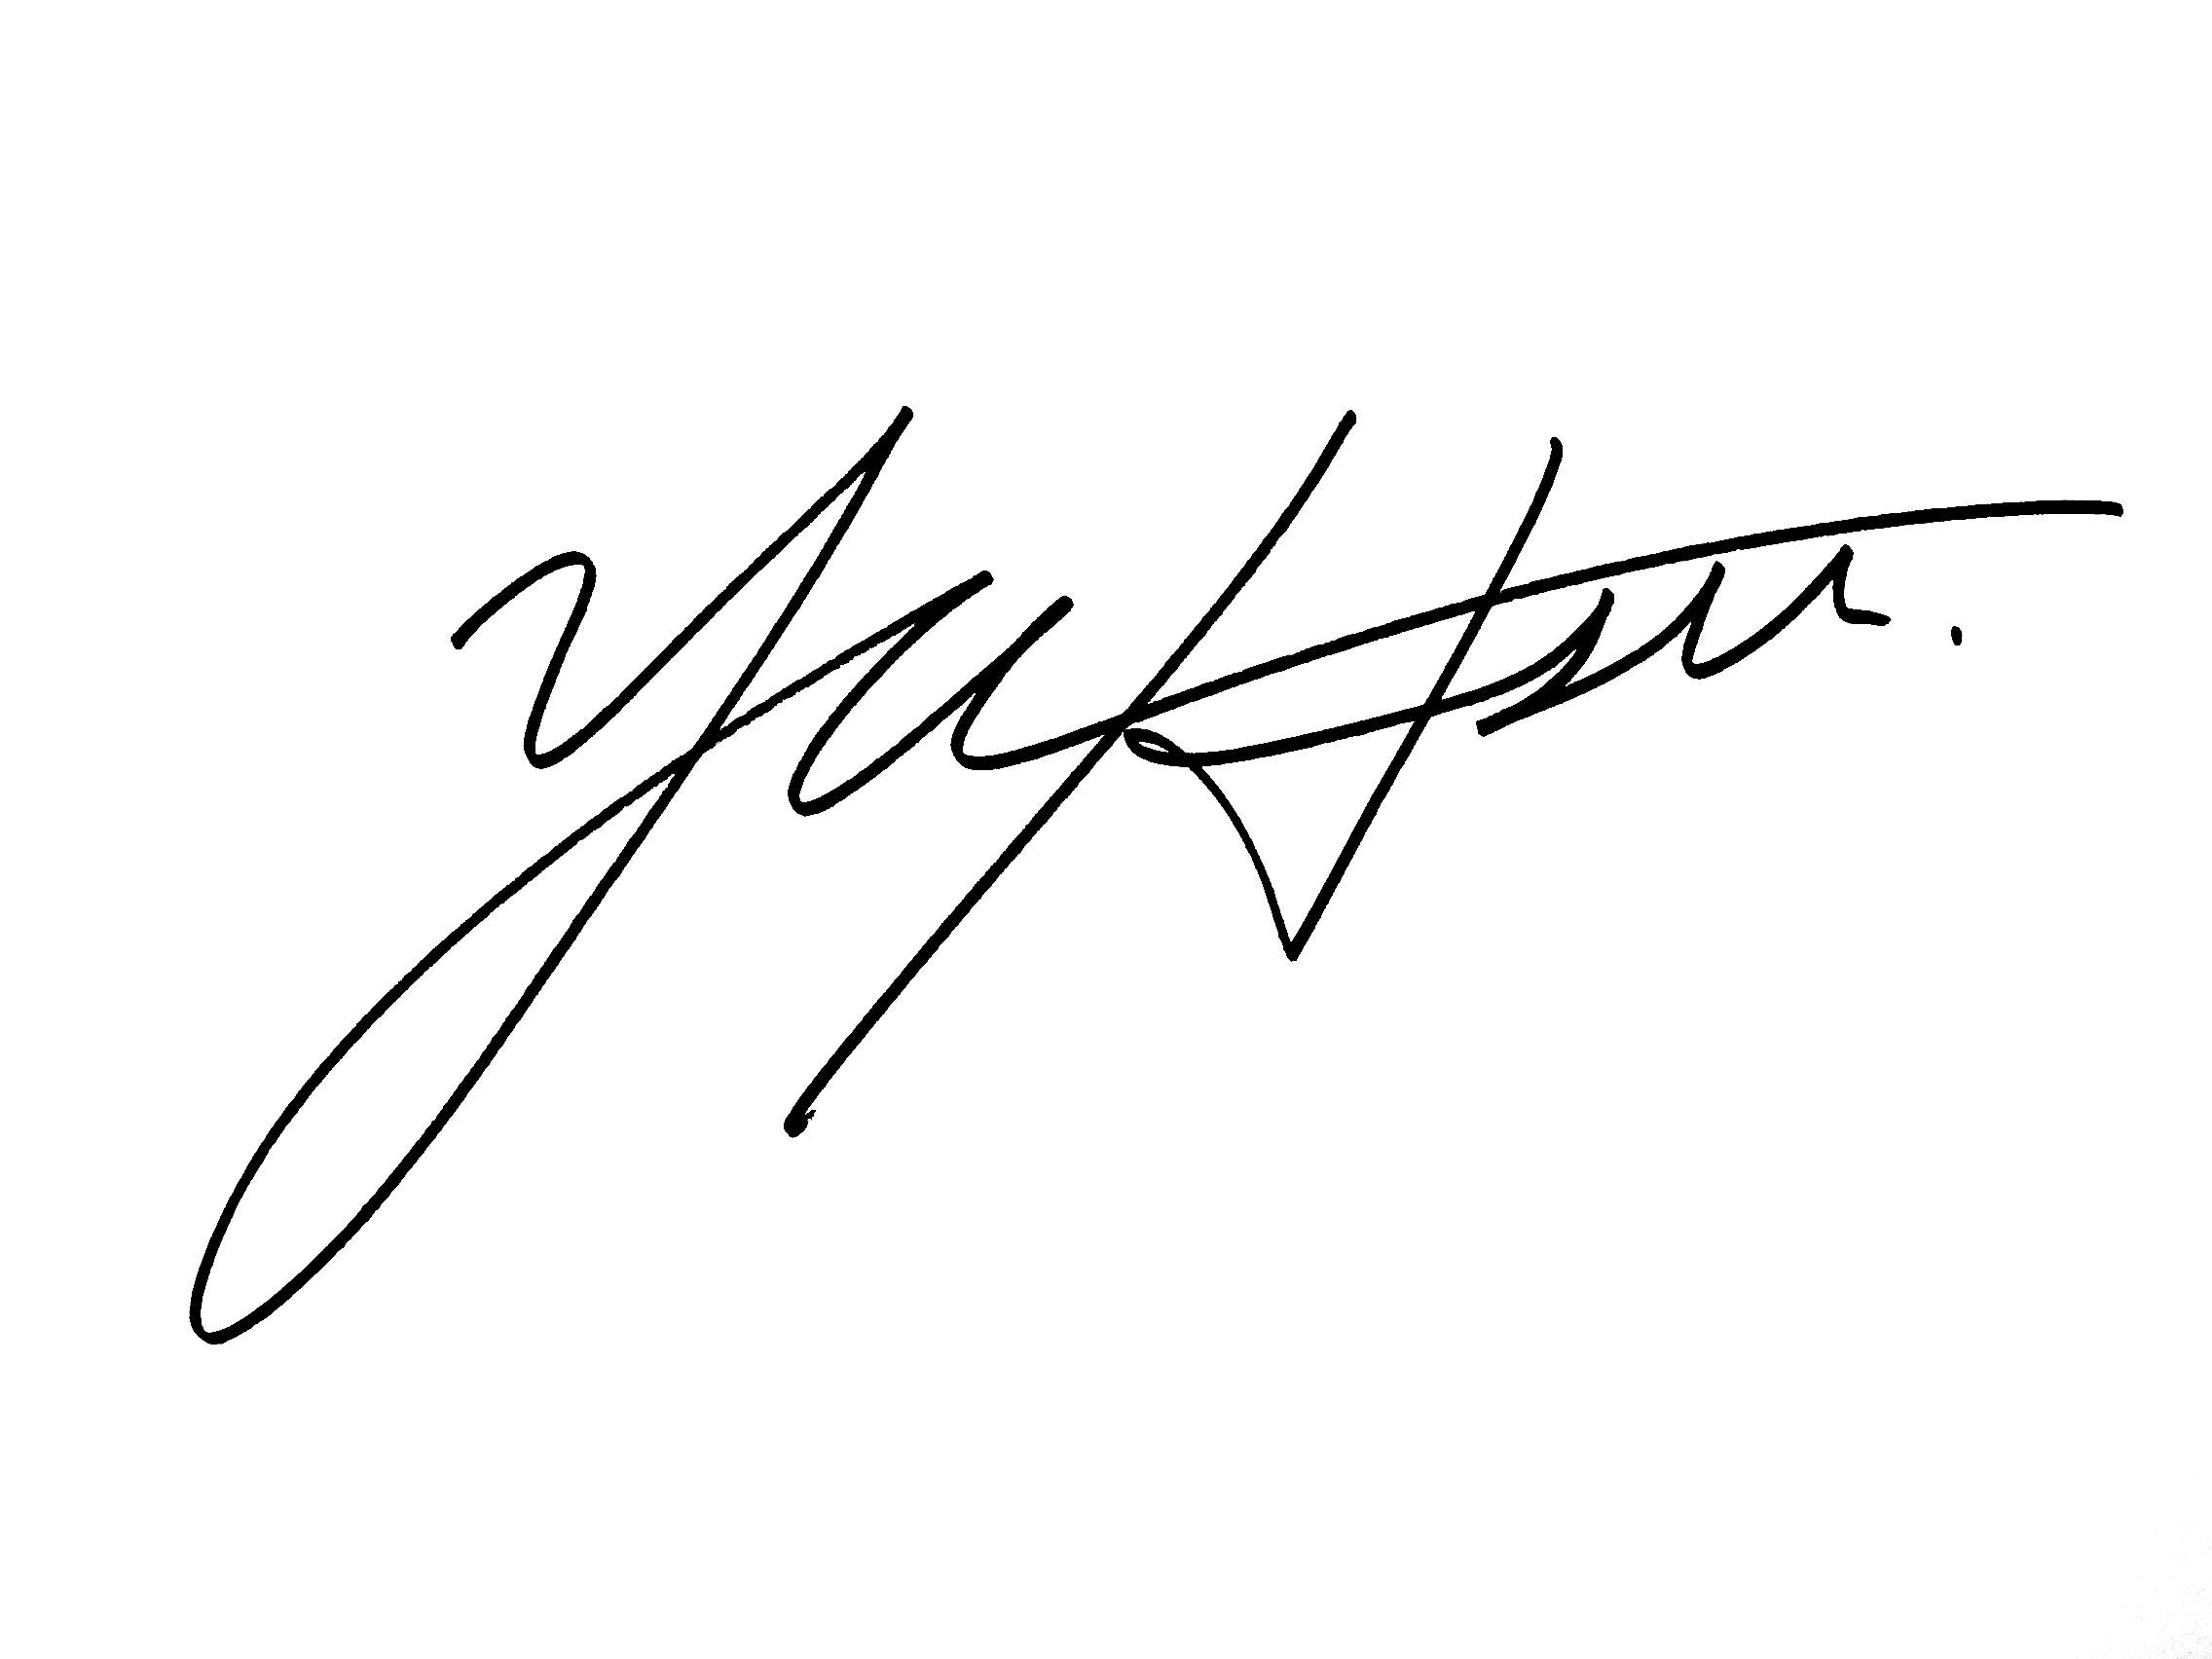 Hyun-su (Anna) Yu's Signature